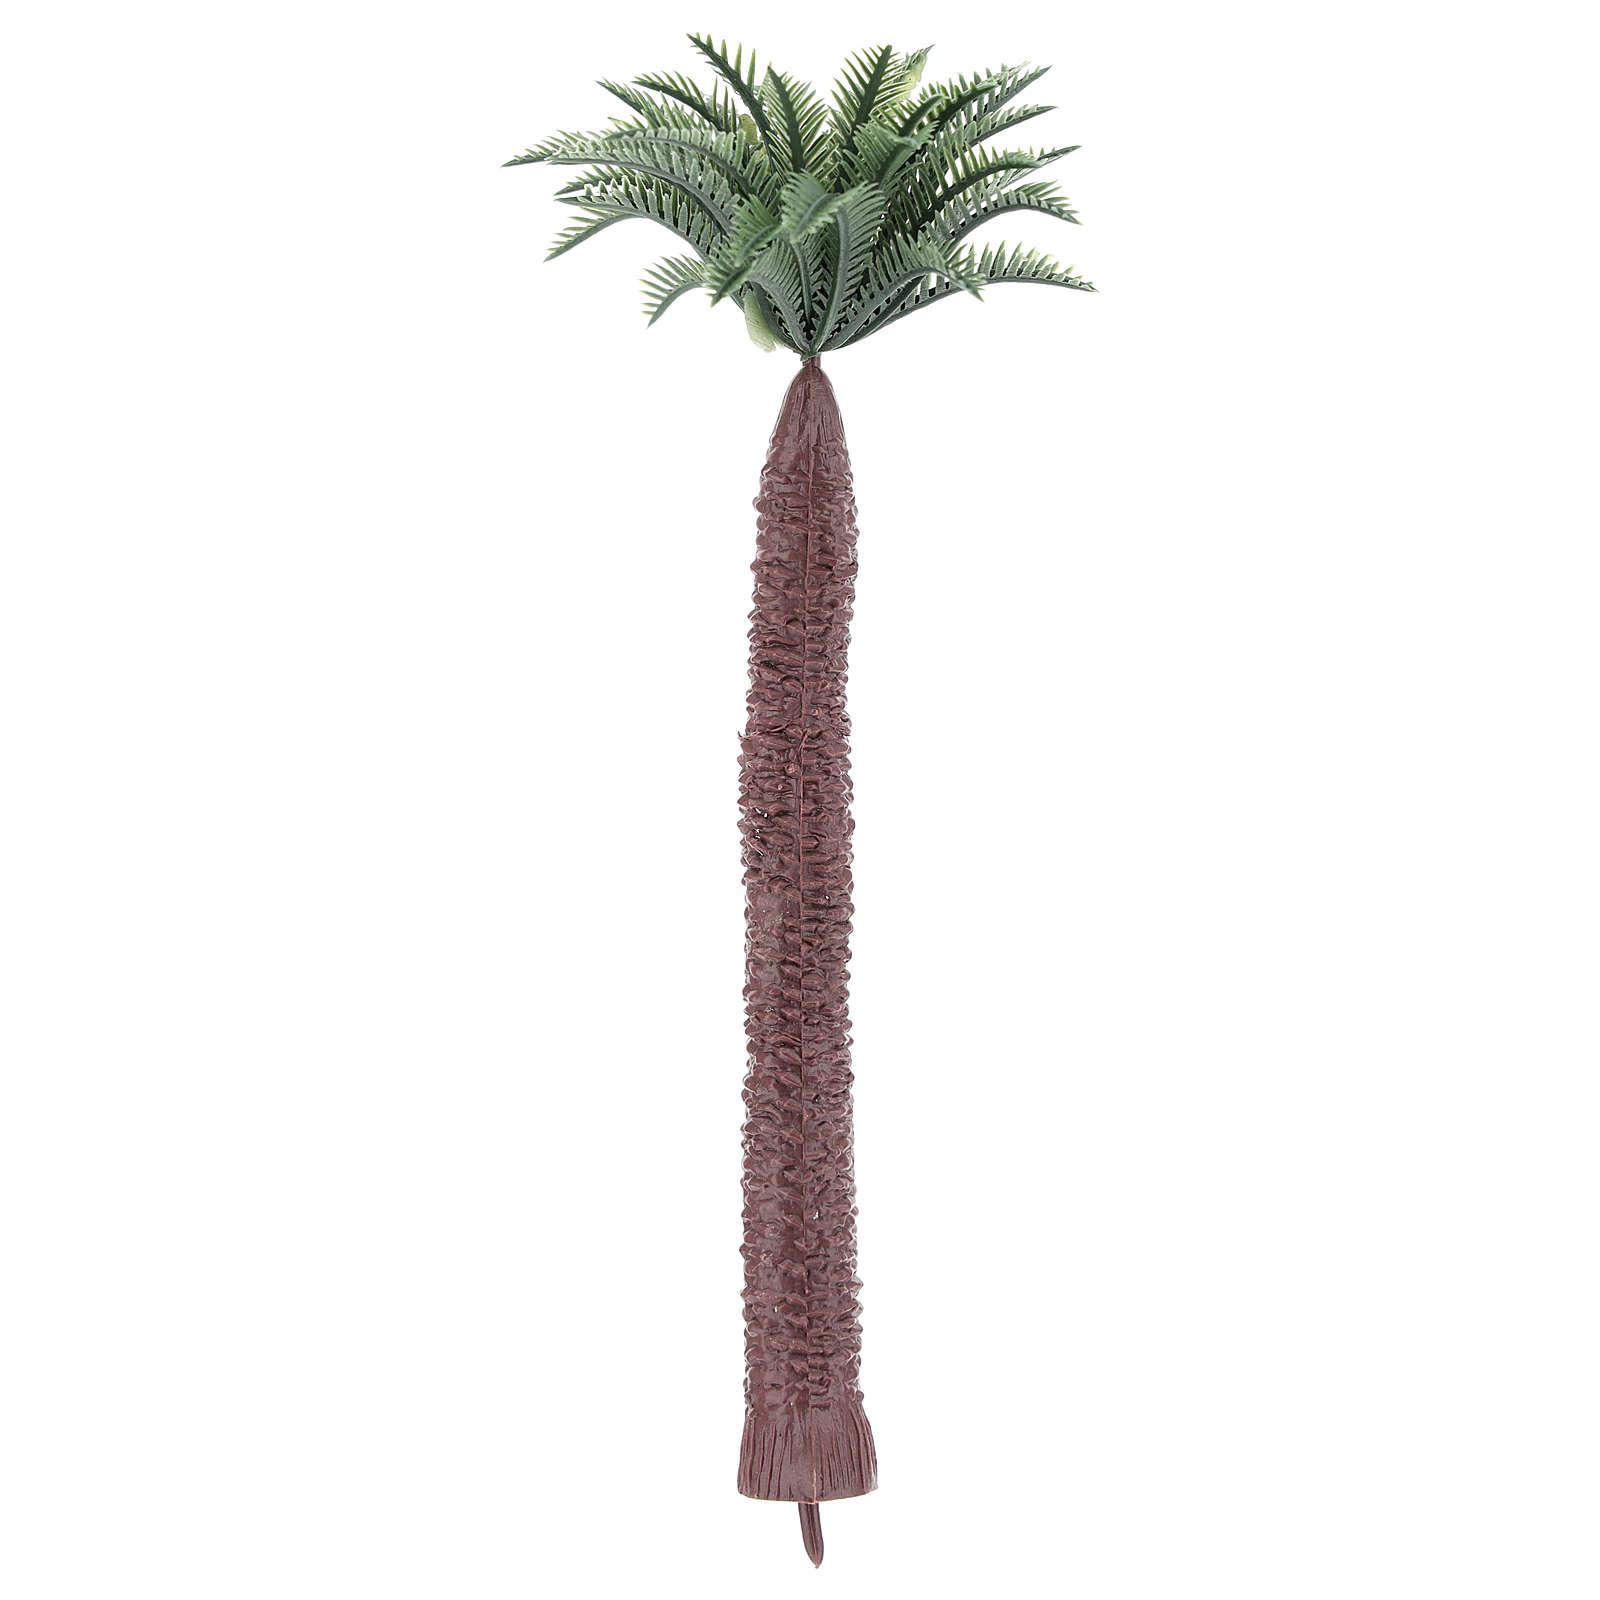 Palma senza base per presepe fai da te altezza reale 17 cm 4